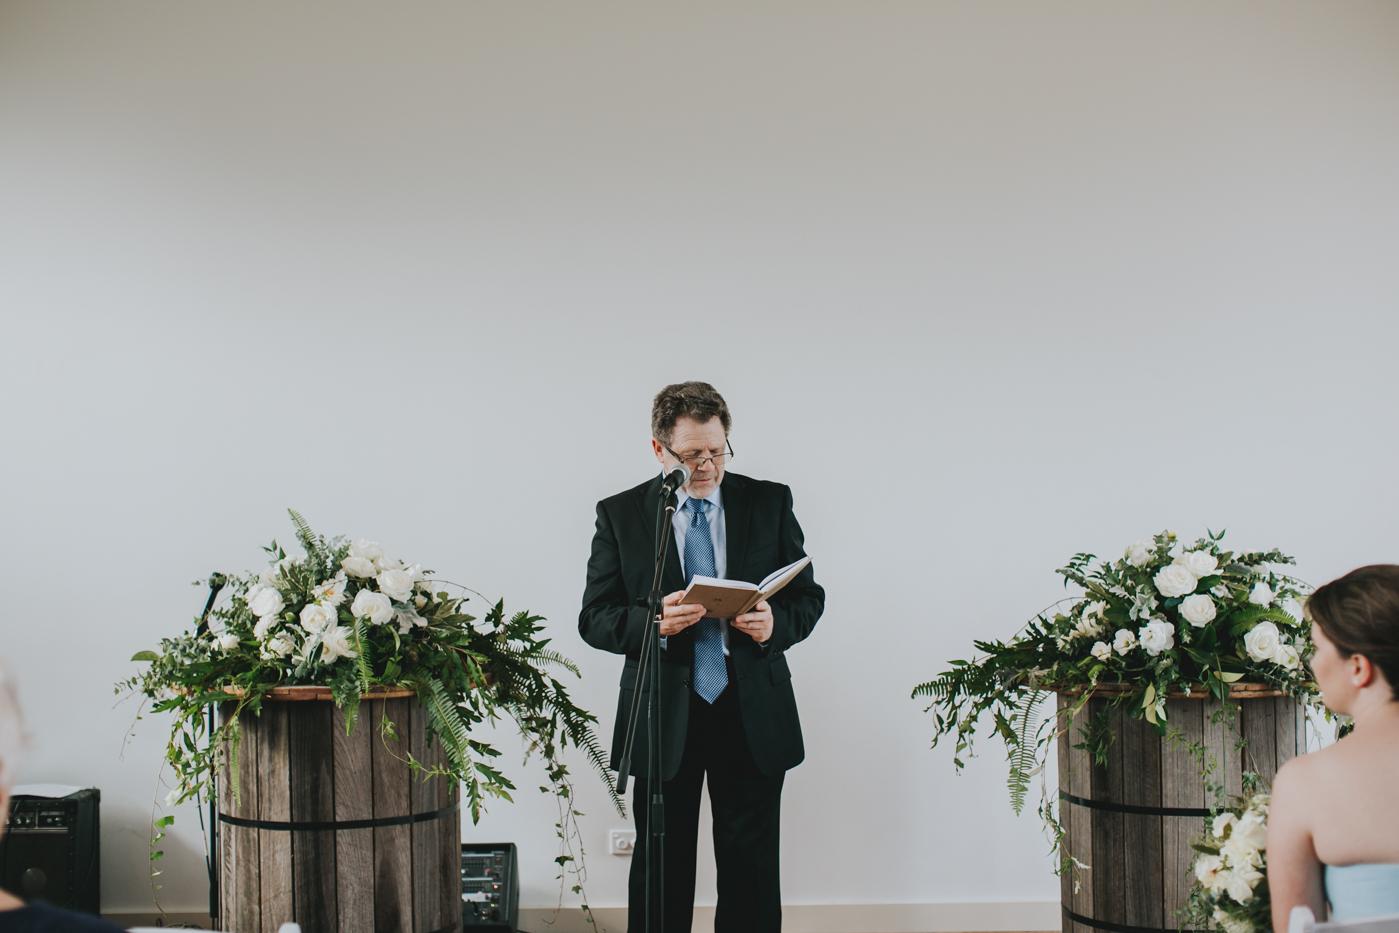 Rachel & Jacob - Willow Farm Berry - South Coast Wedding - Samantha Heather Photography-71.jpg